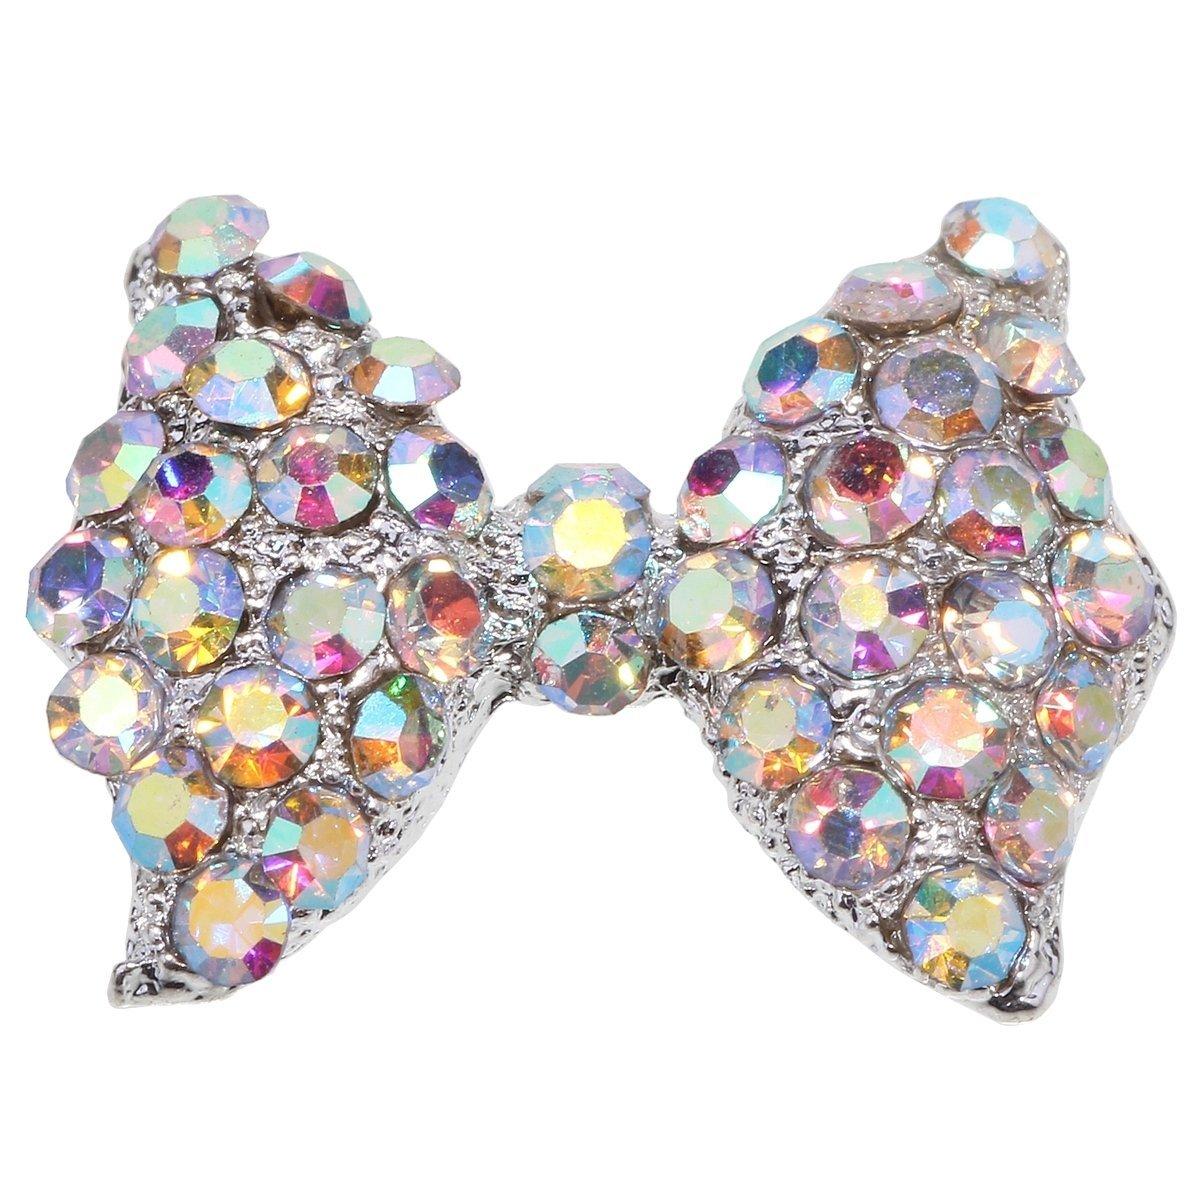 BeautyFly 10 Pieces DIY 3D Alloy AB Rhinestones Bow Tie Nail Art Tips Glitters Decorations Juren E-commerce